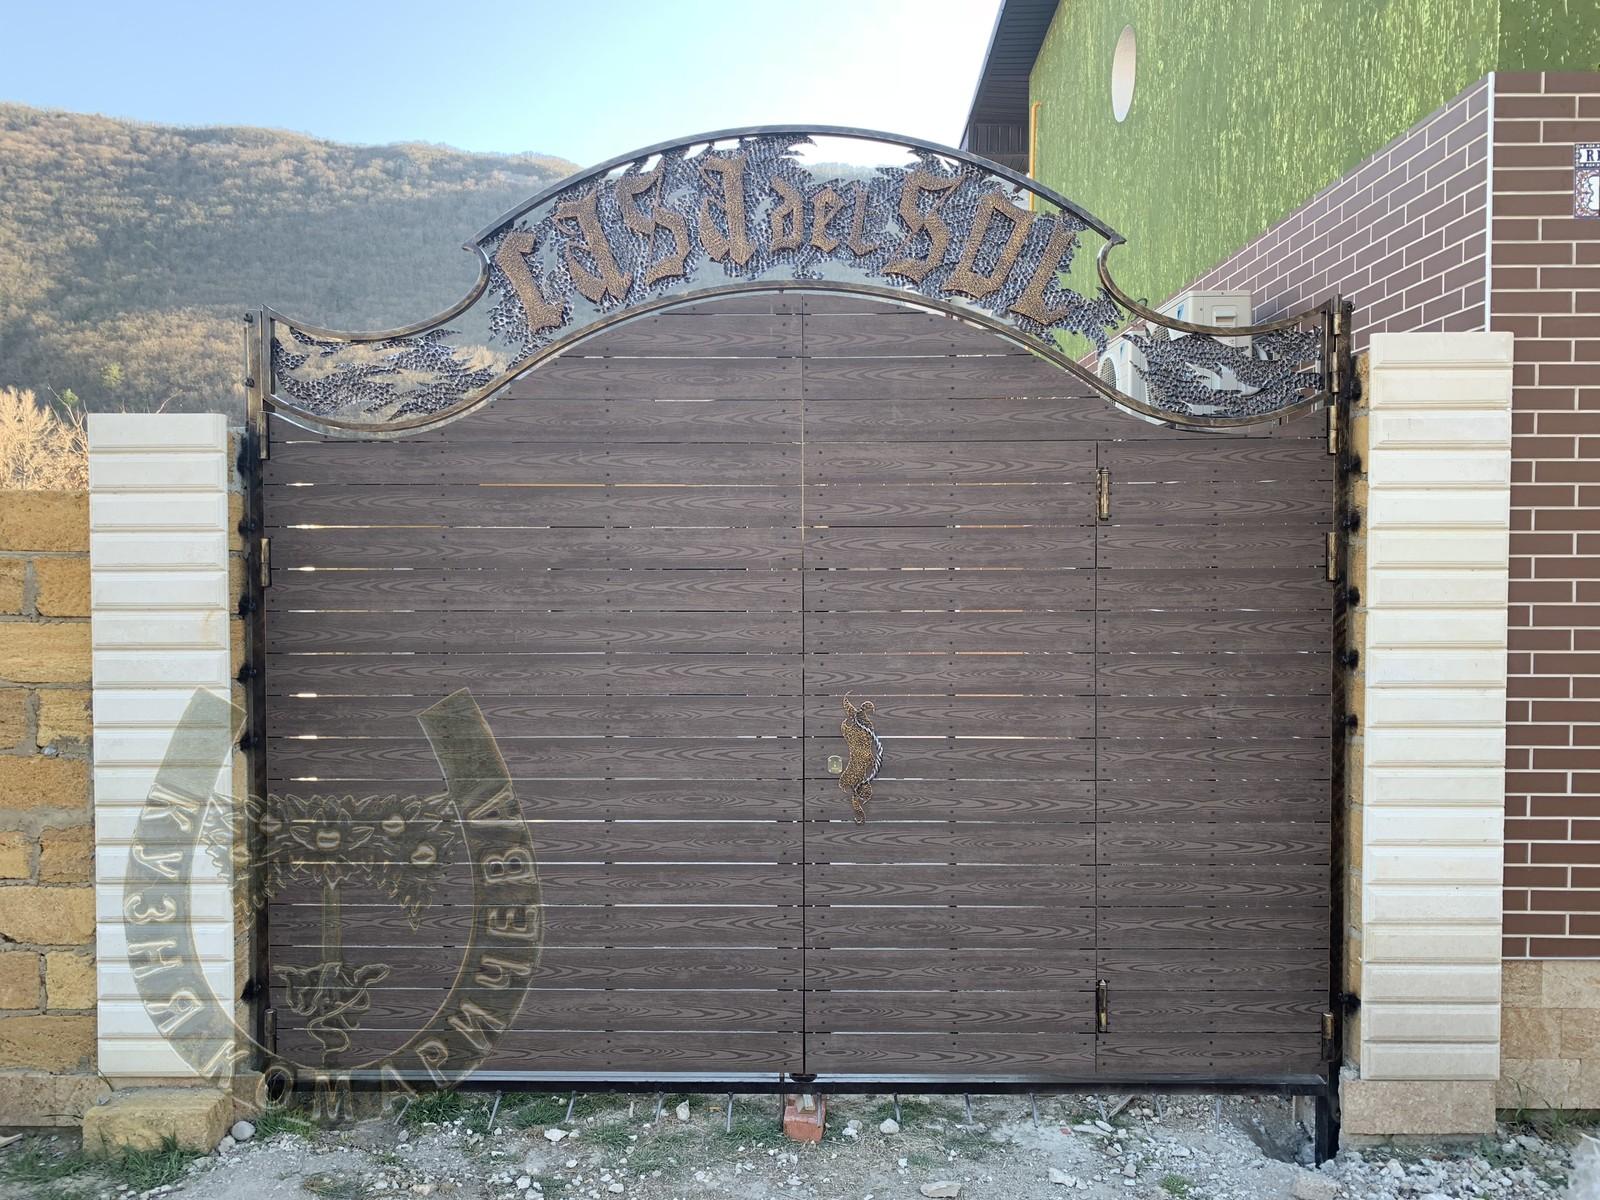 Ворота CASA del SOL. Дата изготовления: 2019 год